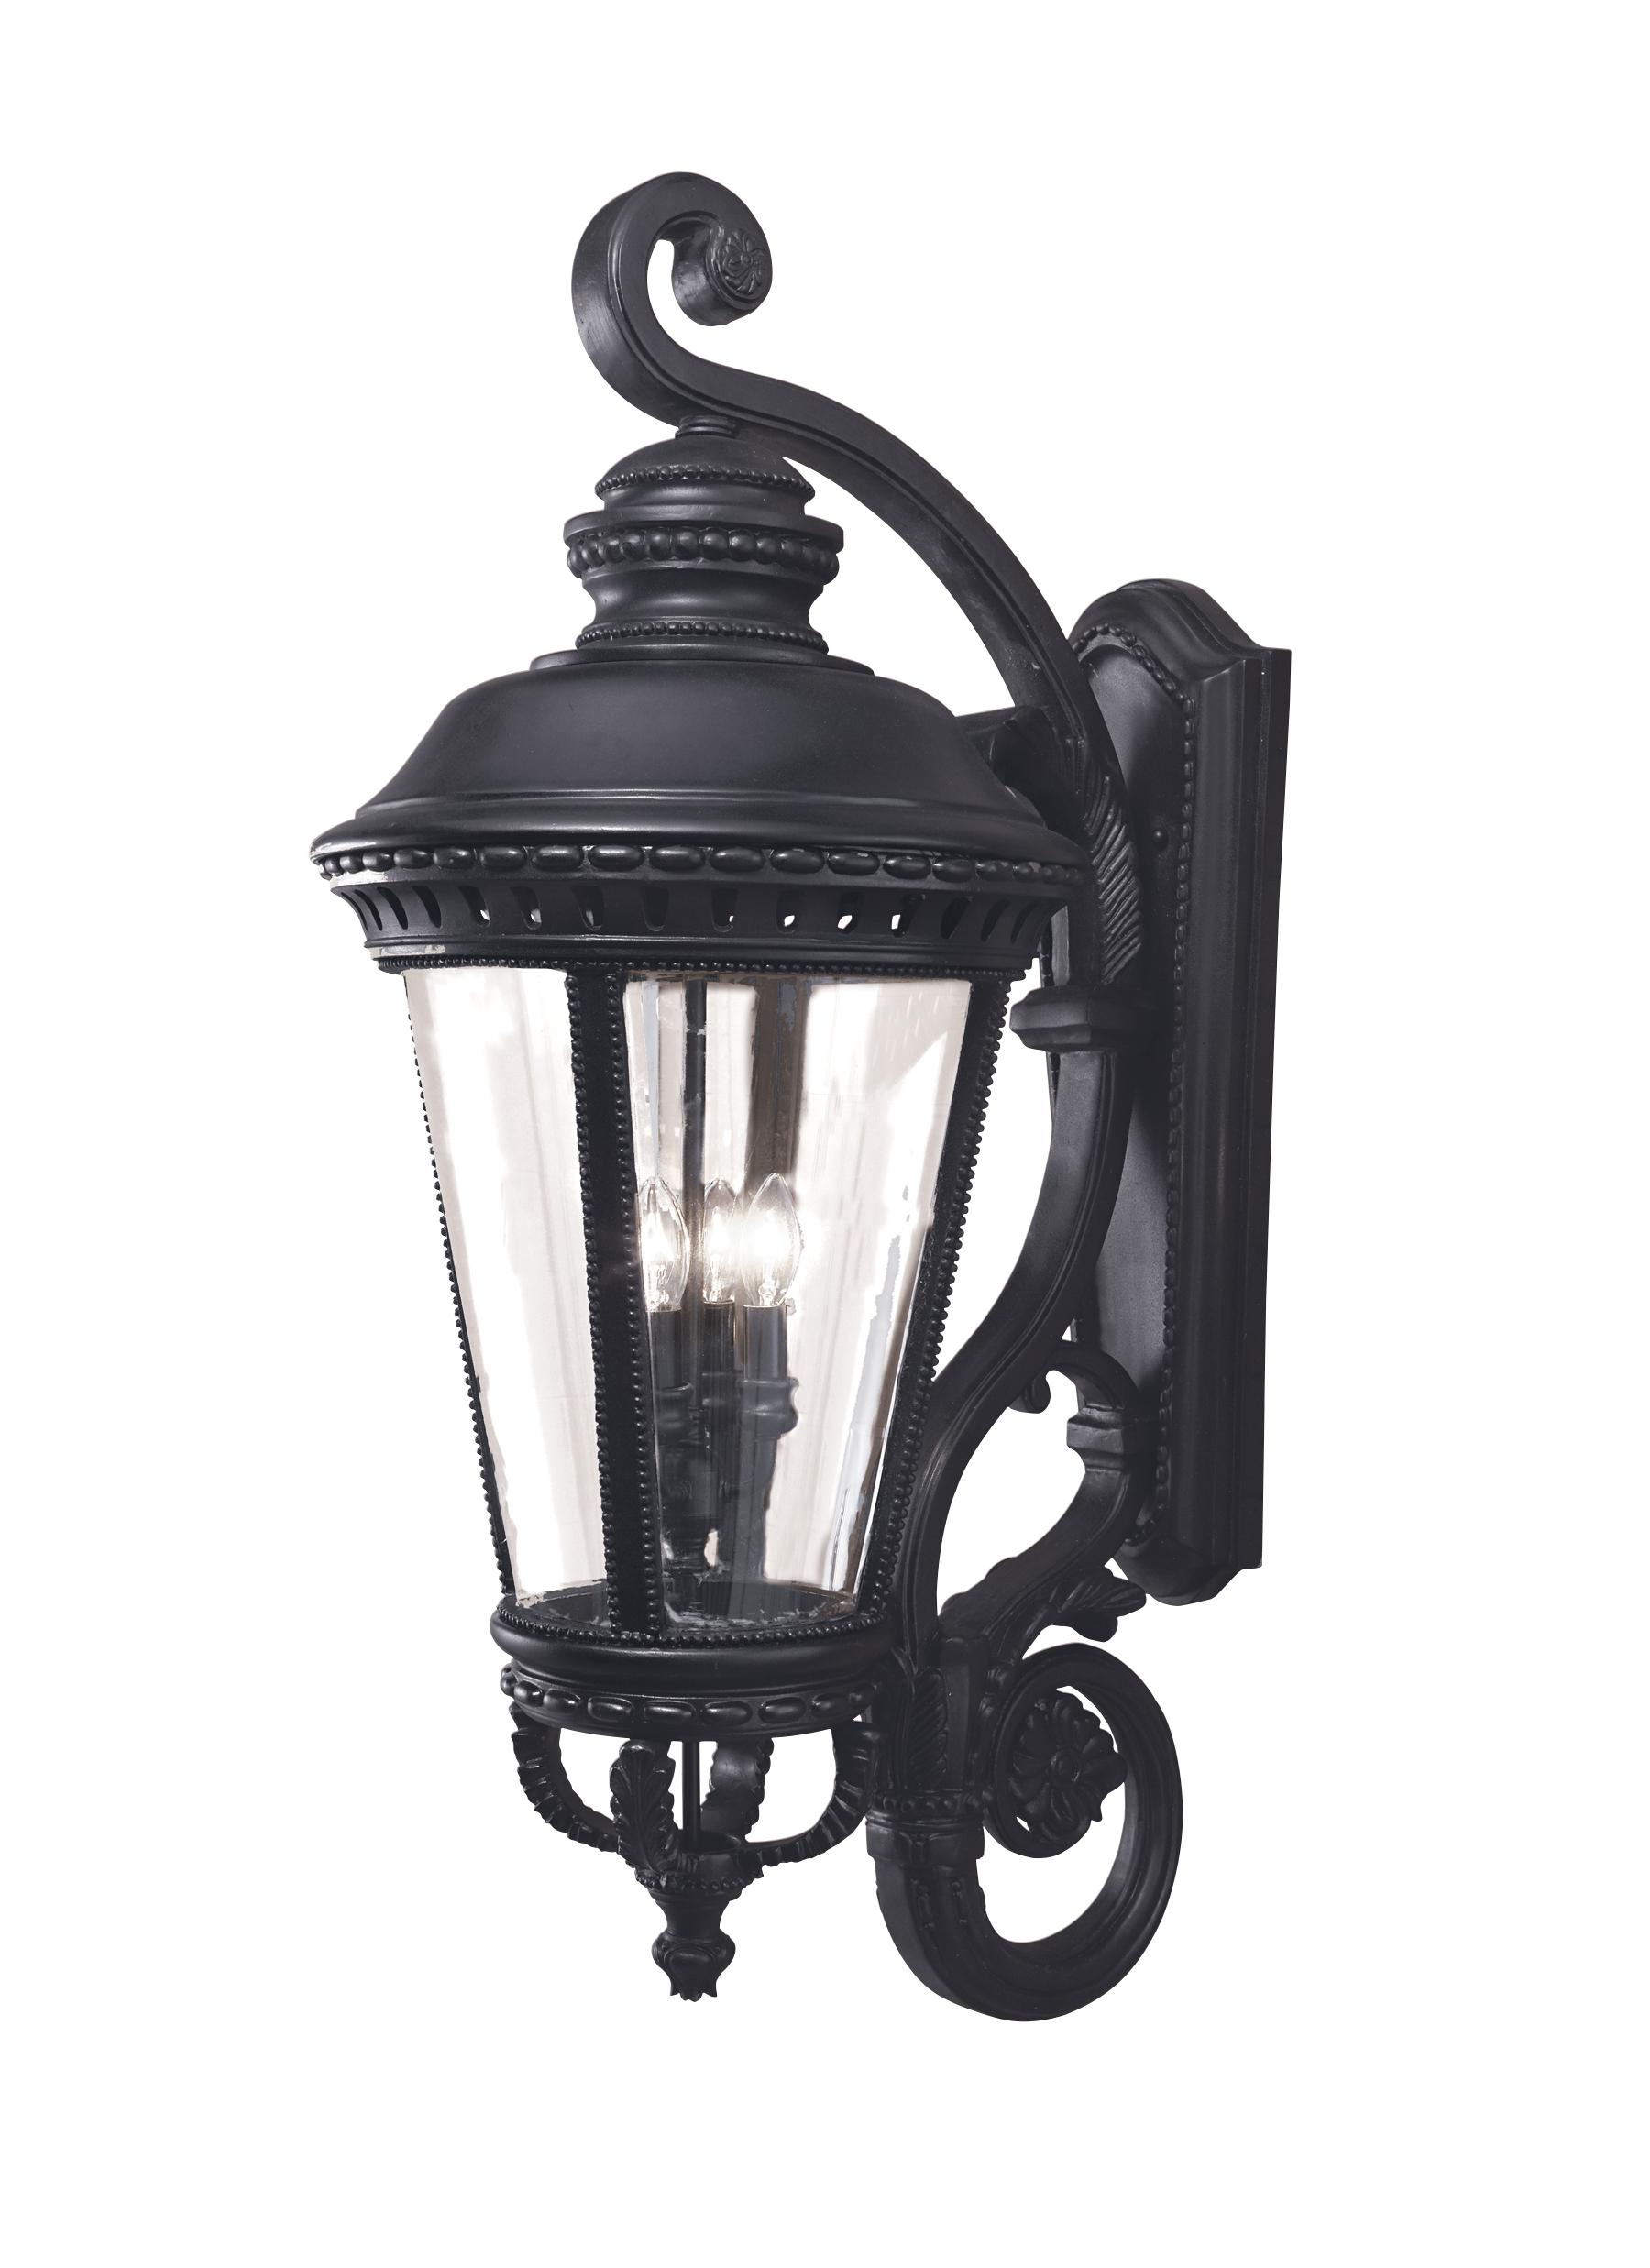 OL1905BK,4 - Light Wall Lantern,Black